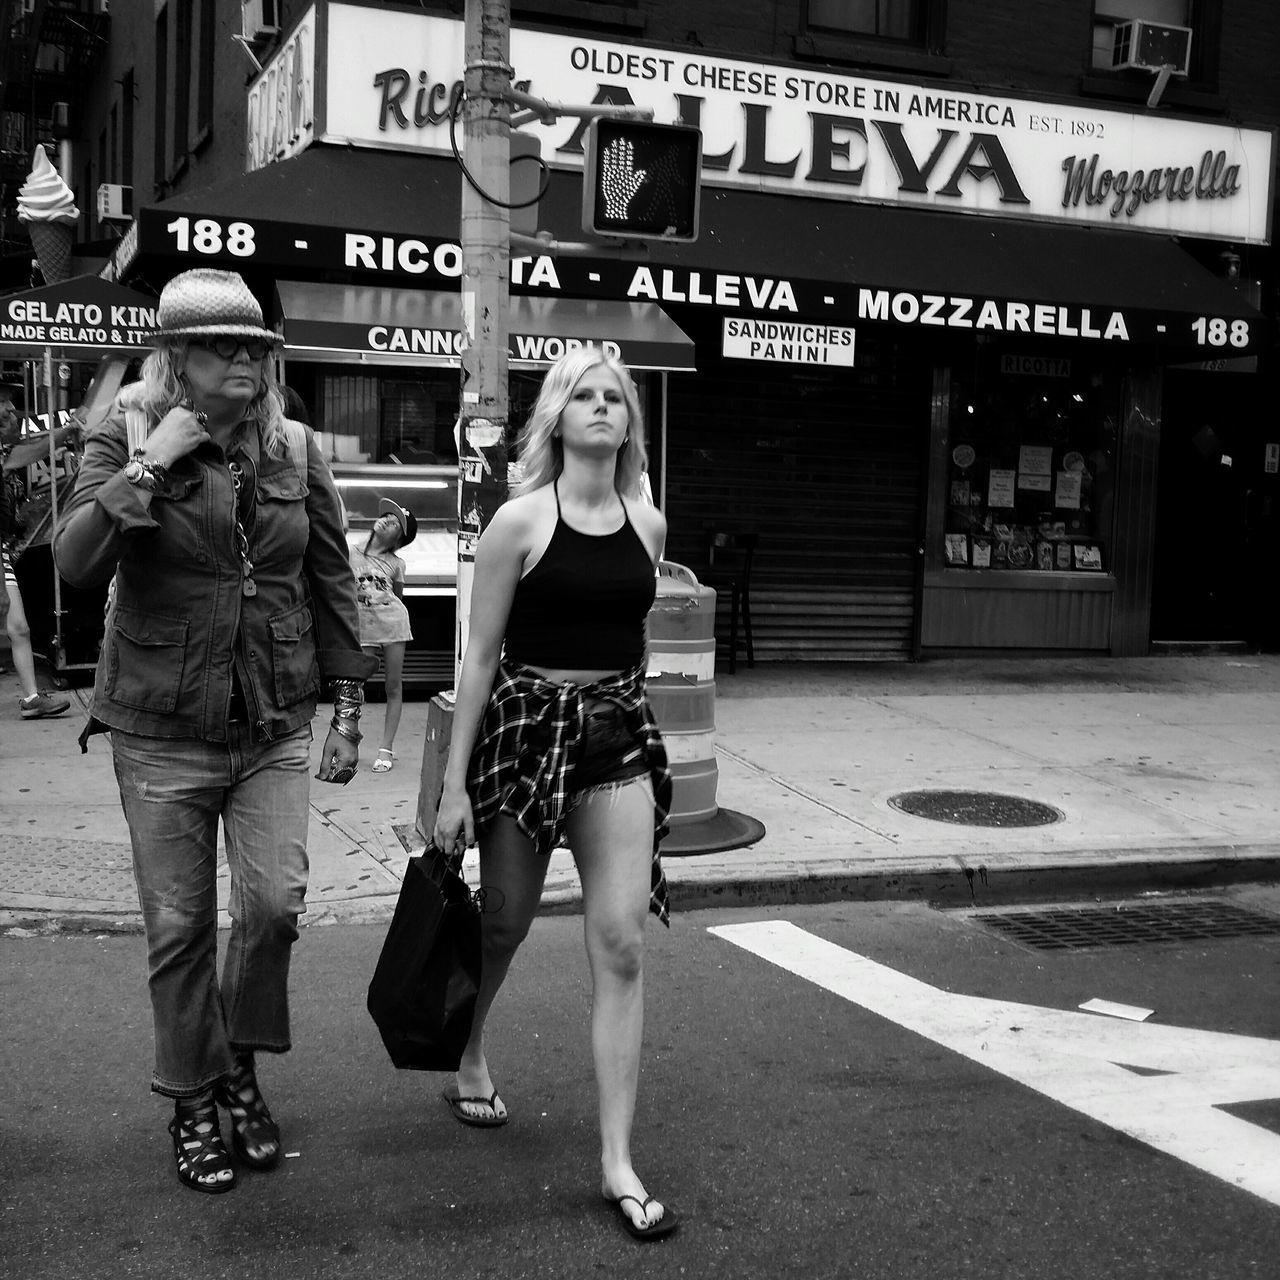 Street Protography Blackandwhite Photography Blackandwhite Newyorkcity Streetphoto_bw EyeEm Best Shots - Black + White The Street Photographer - 2015 EyeEm Awards New York ❤